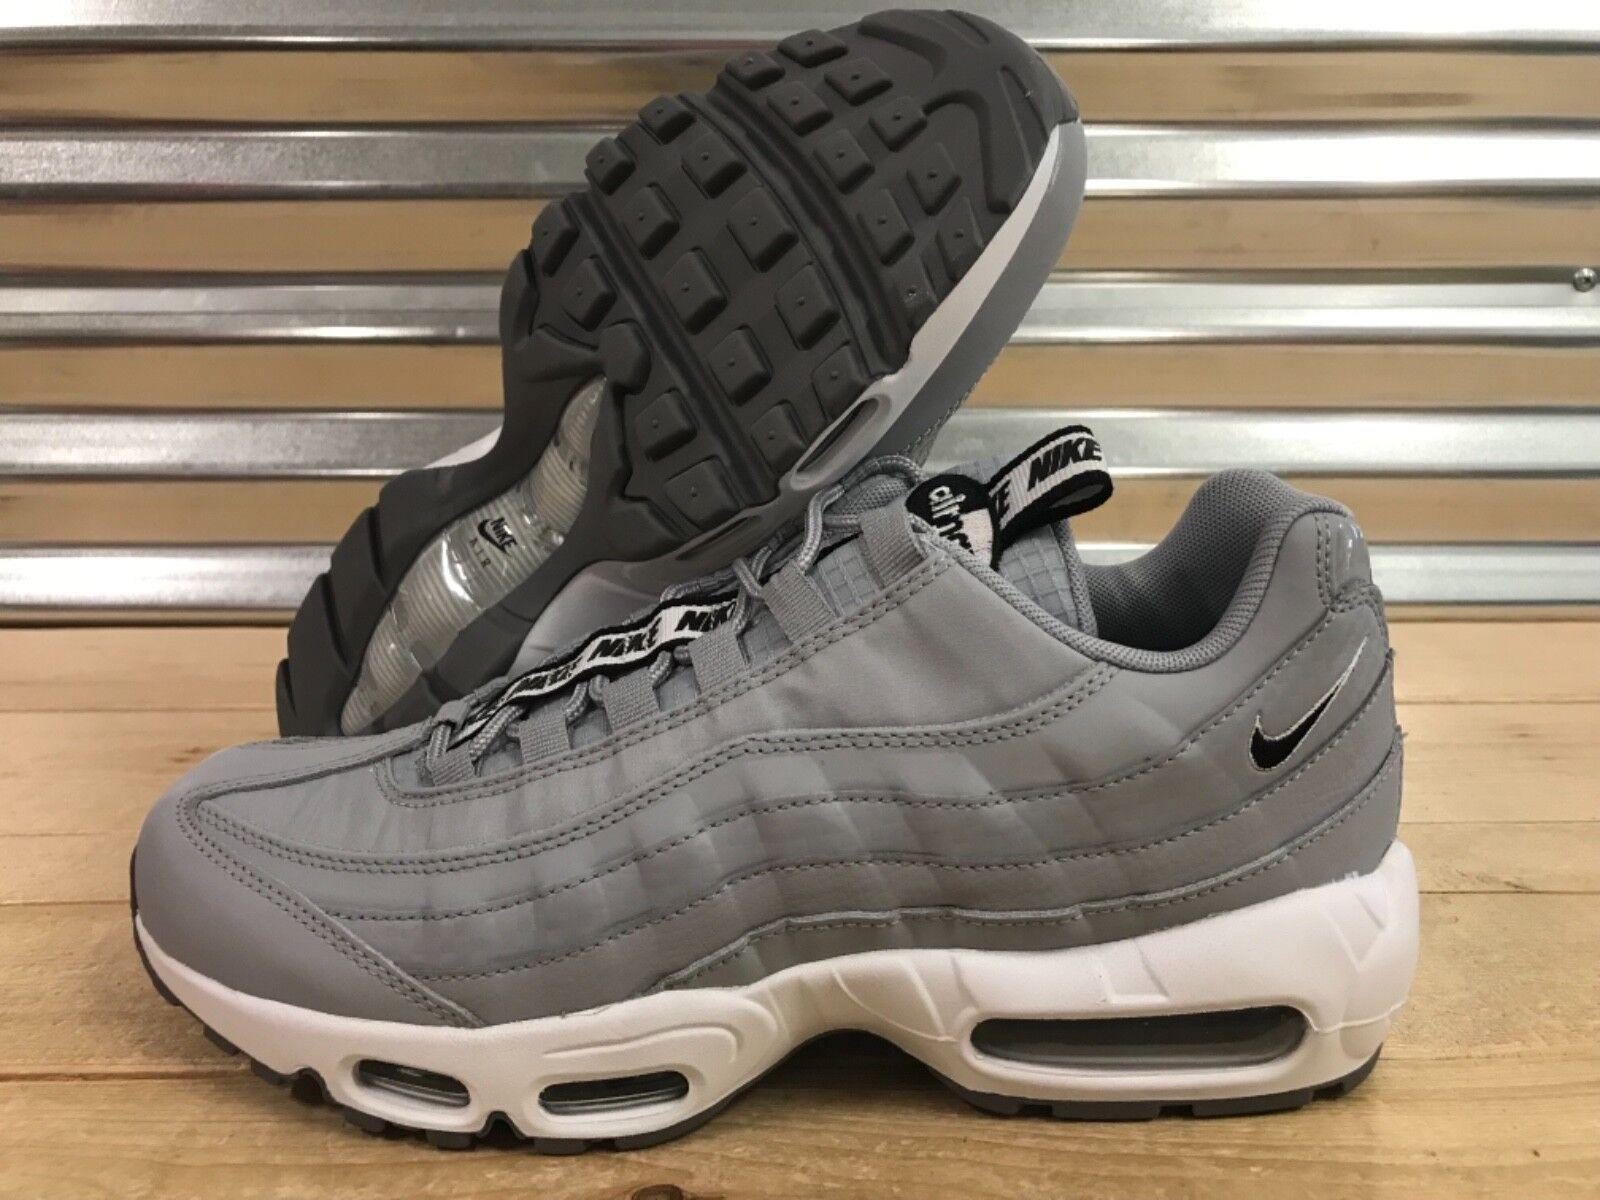 Nike Nike Nike Air Max 95 SE Pull Tab Running scarpe Wolf grigio bianca SZ ( AQ4129-001 ) 210a52